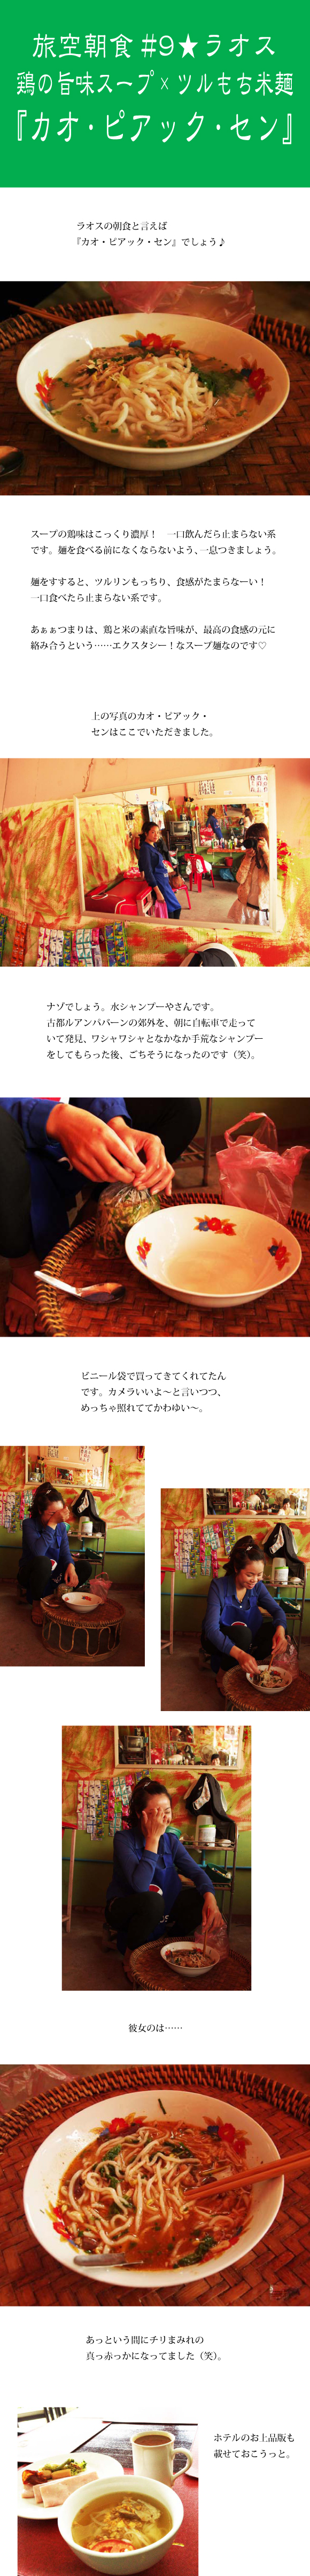 tomako170125.jpg